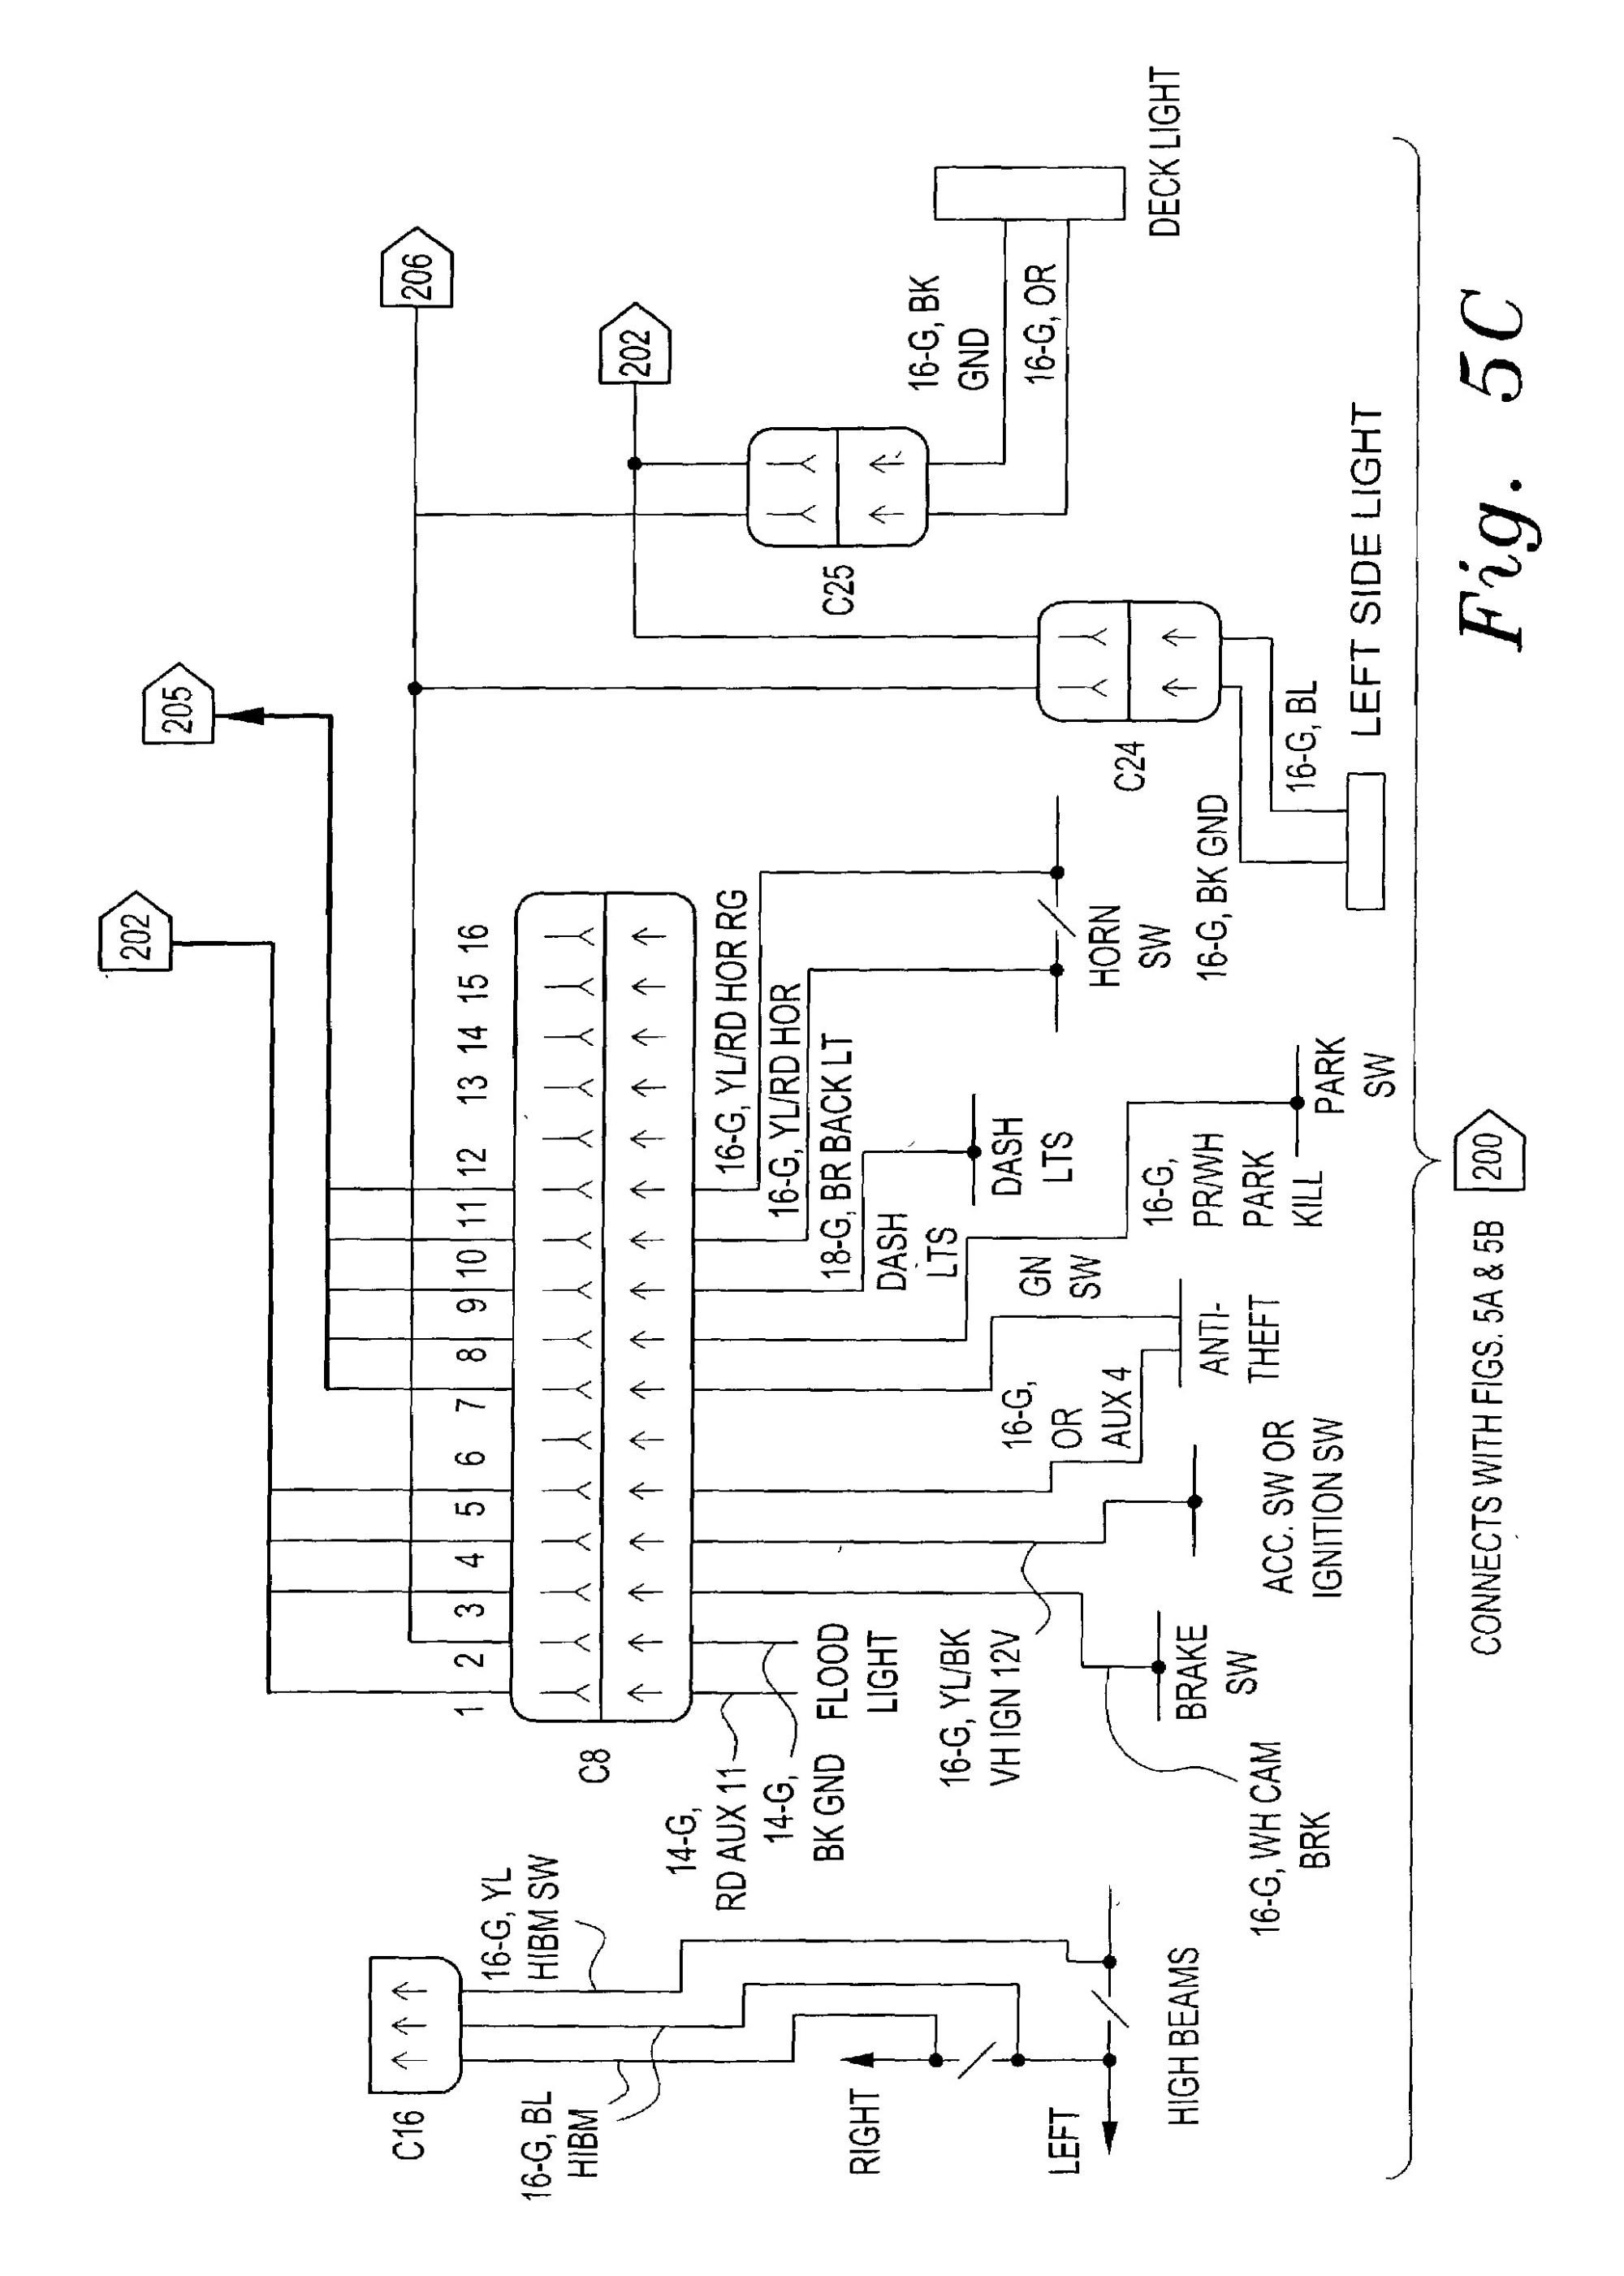 hight resolution of cencom siren wiring diagram wiring diagram tags mace siren wiring diagram